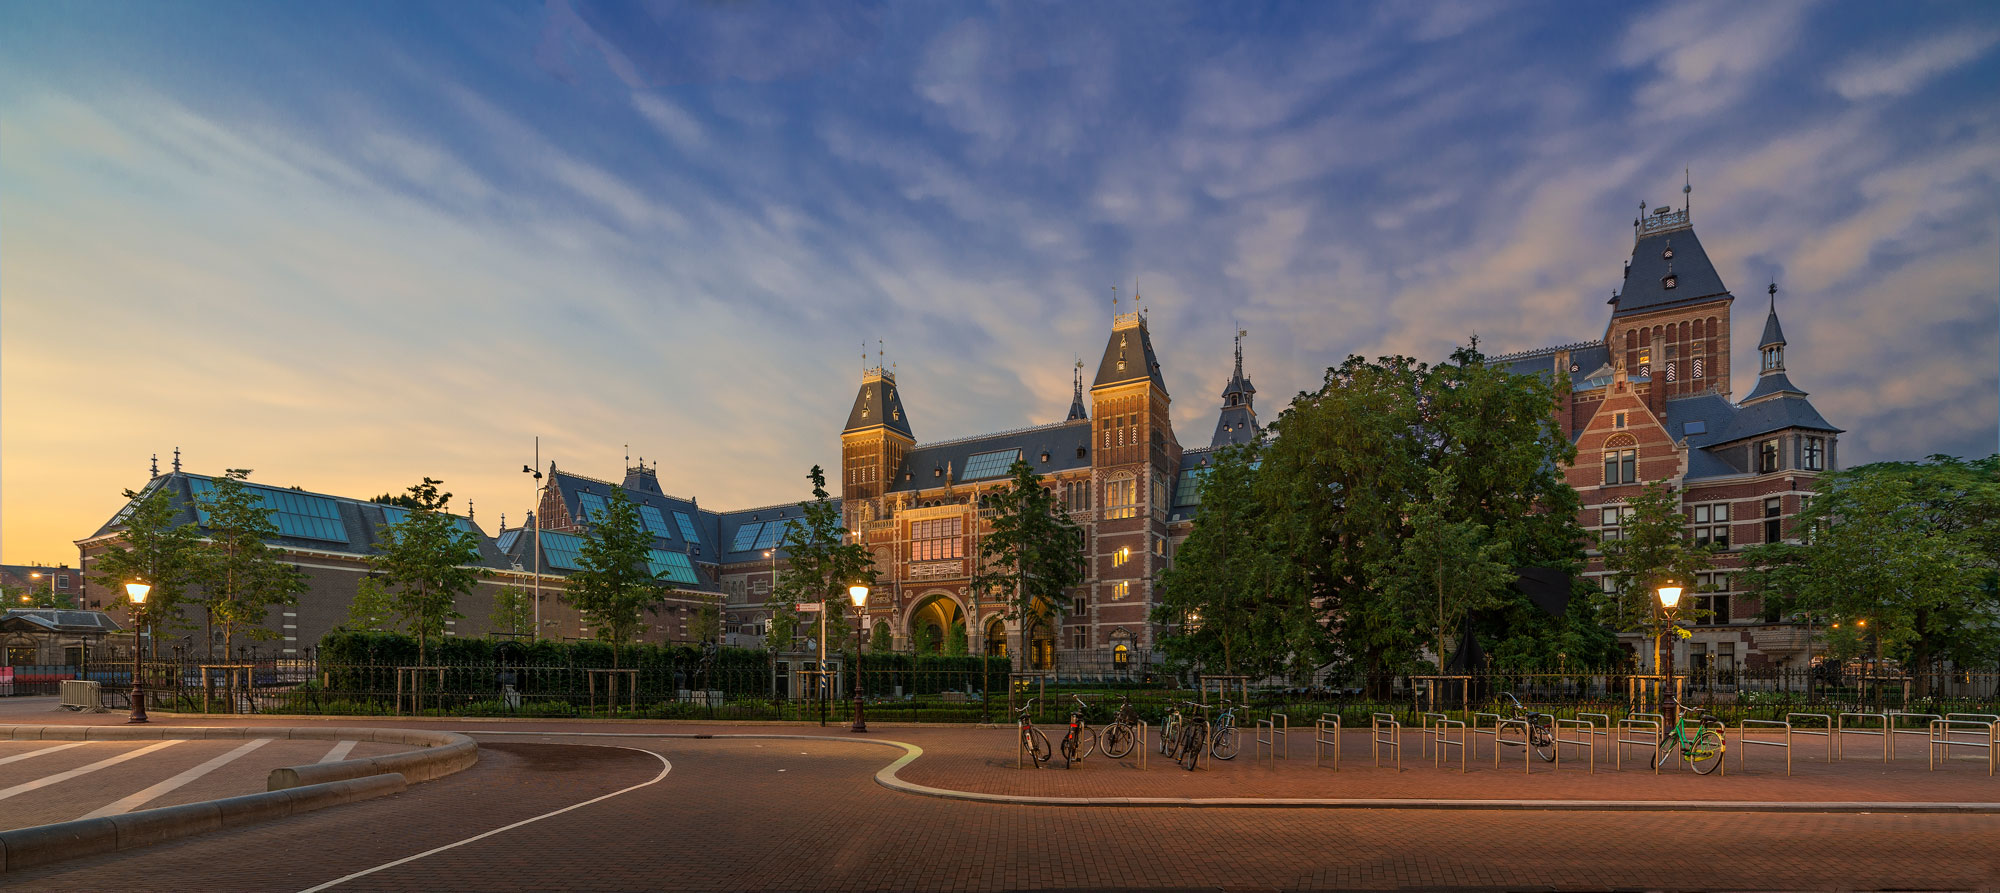 Rijksmuseum - 2014 - John Lewis Marshall